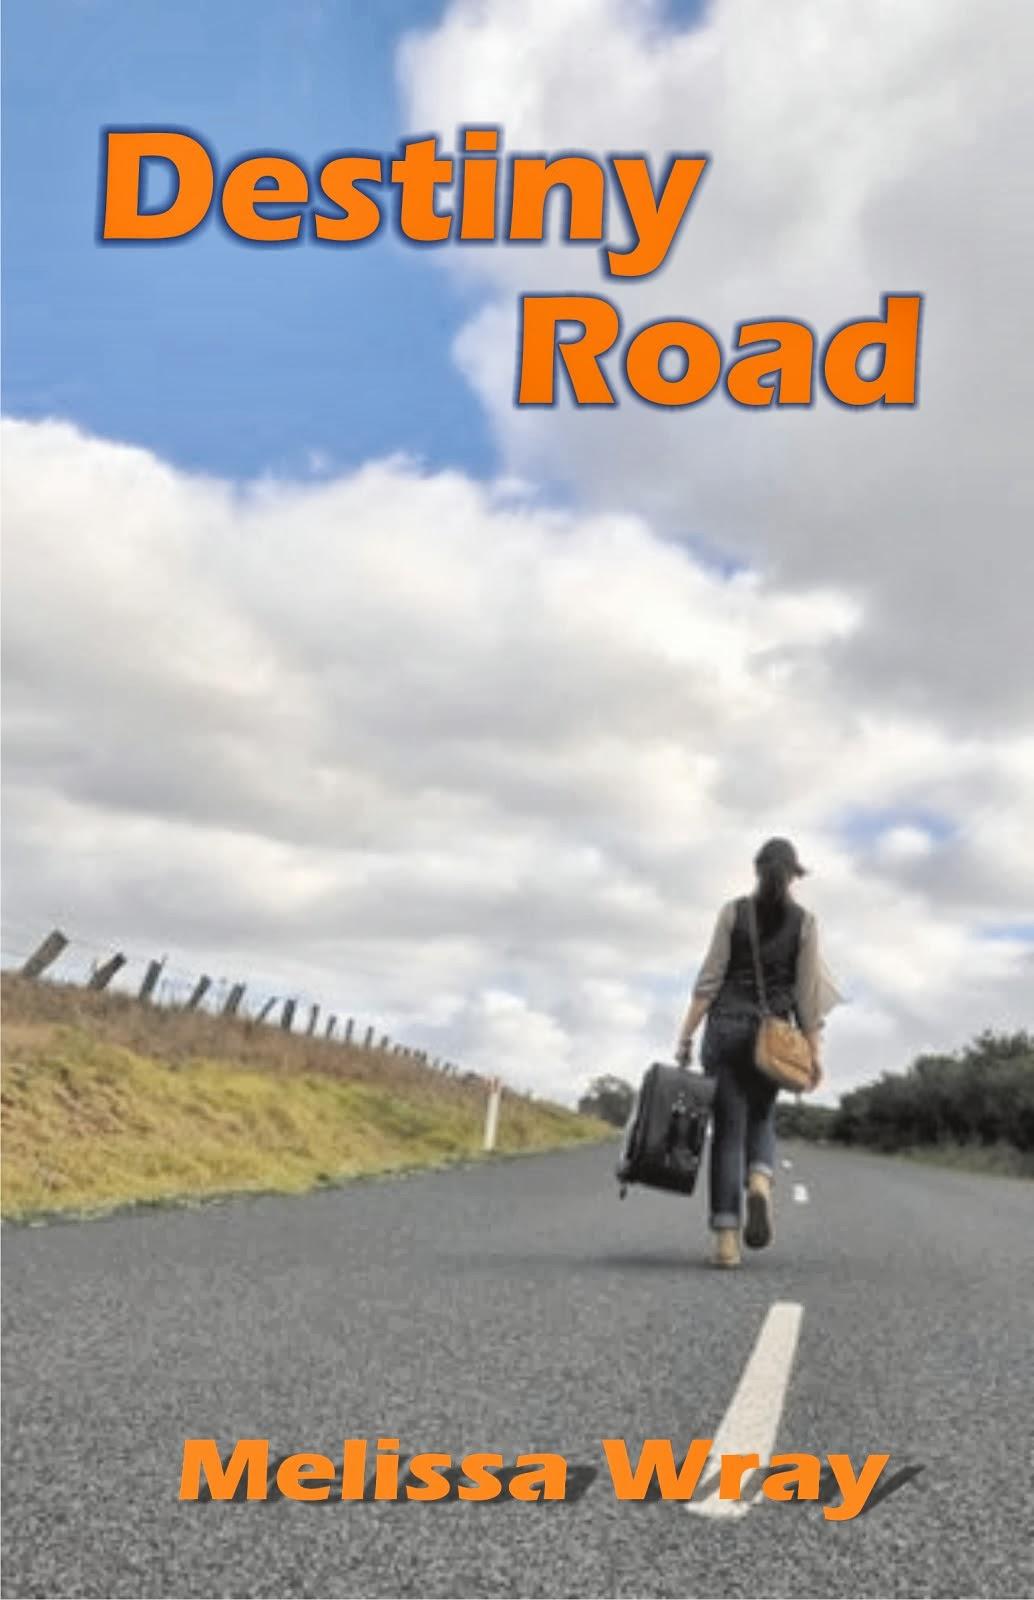 http://www.morrispublishingaustralia.com/destiny-road.html